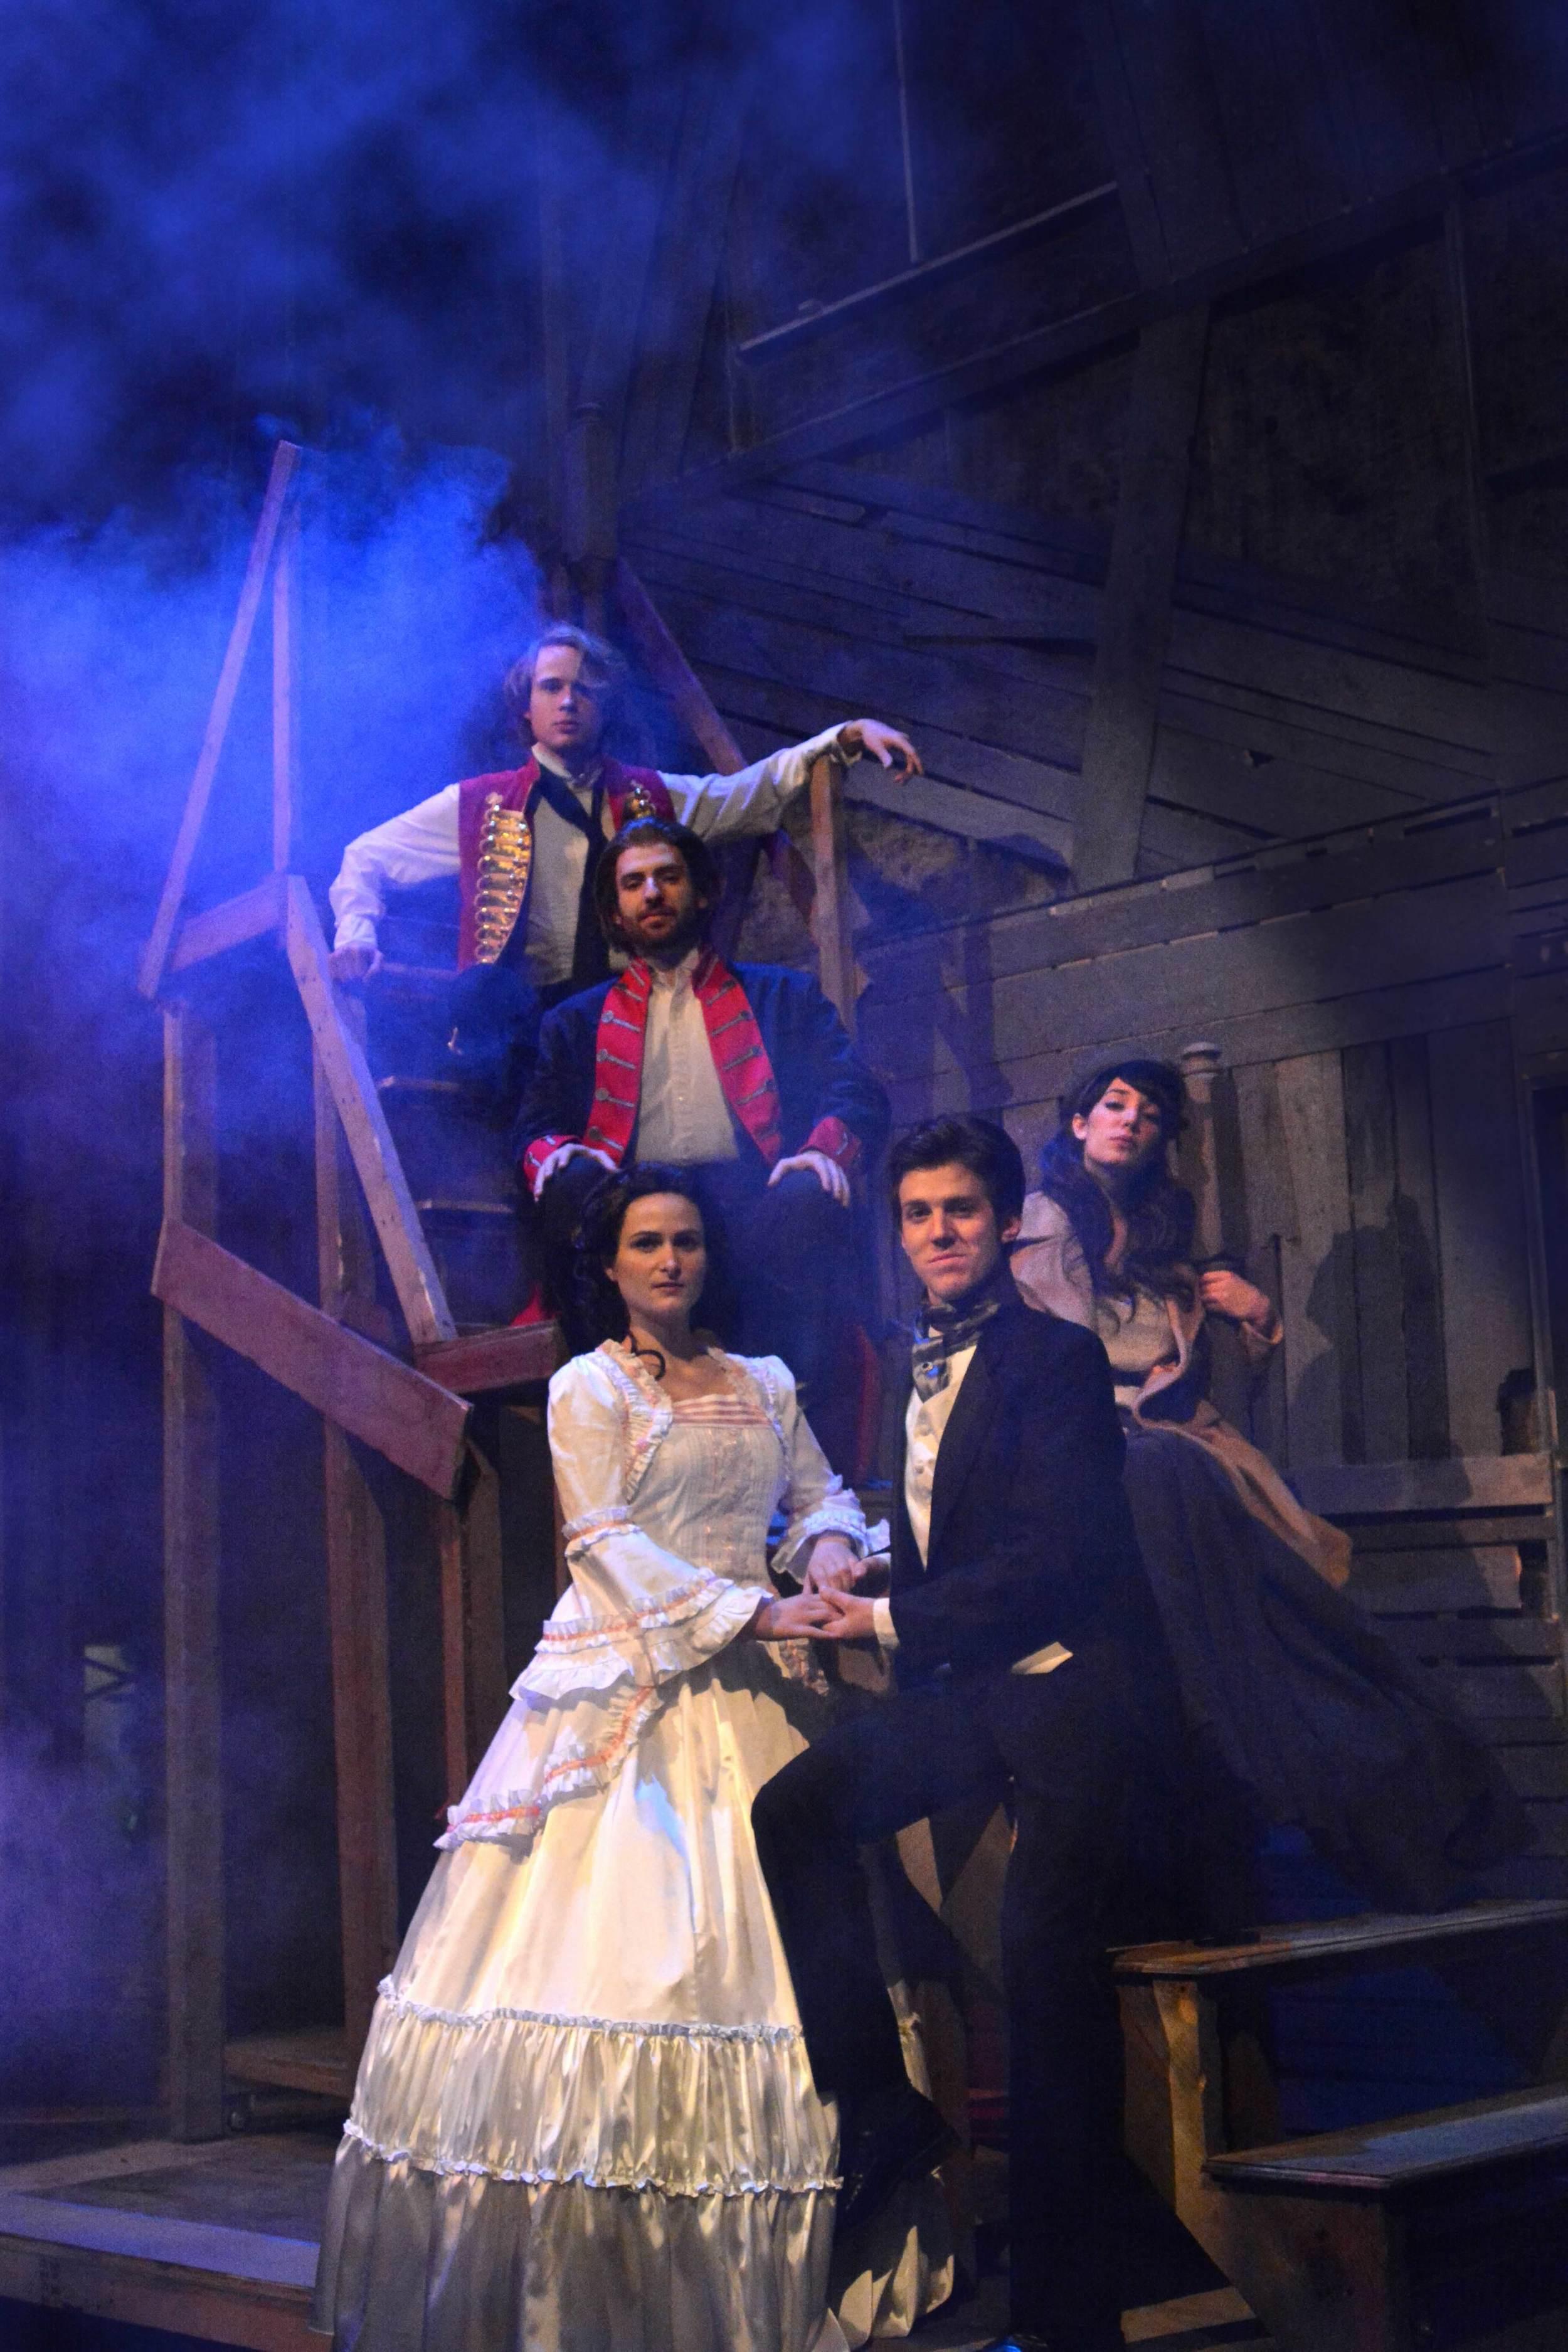 Charlie Tingen as Enjolras (red vest), Landon Sholar as Jean Valjean (blue and red jacket), Becky Rosky as Cosette (white dress), Ethan Carpenter as Marius (tux), Brooke Quintana as Eponine (camel coat)